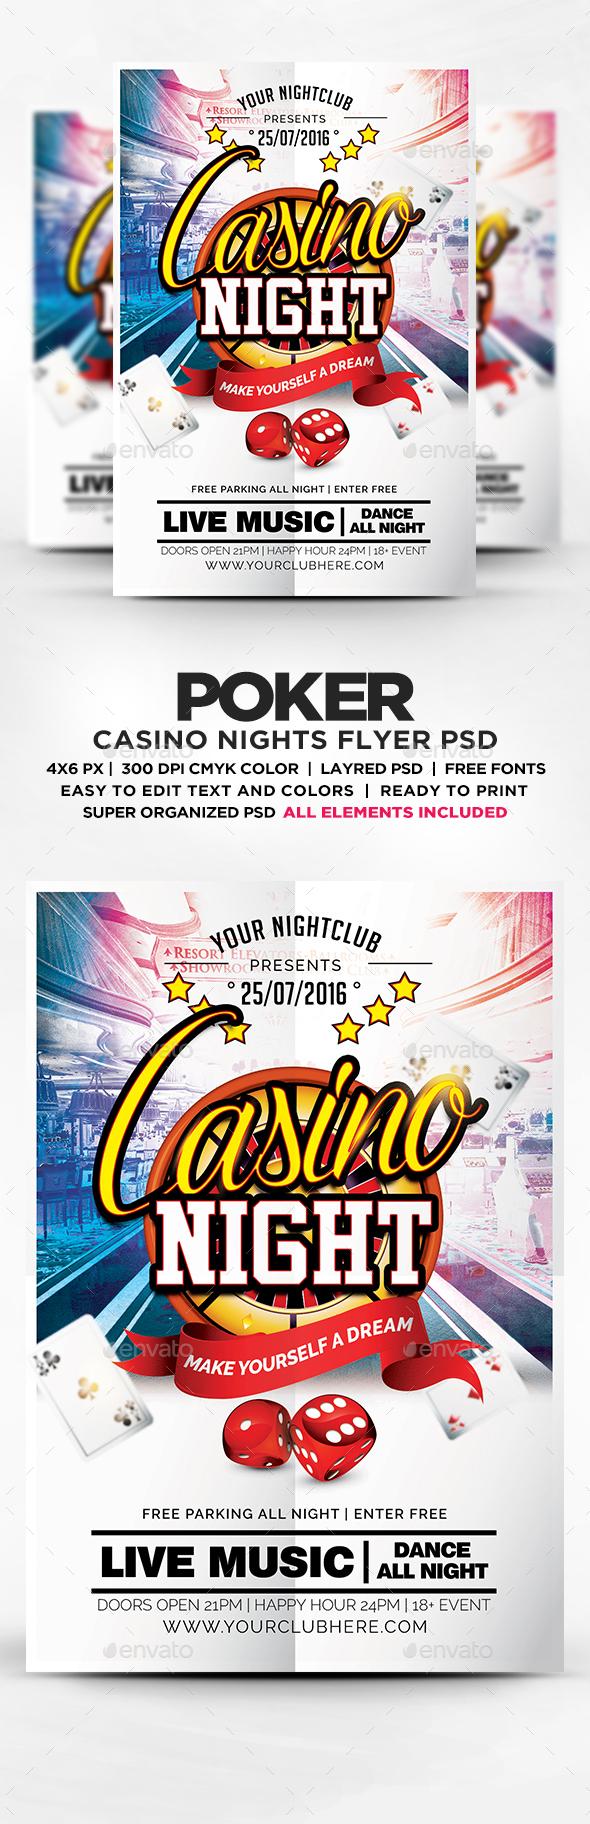 Casino Night Flyer Template PSD